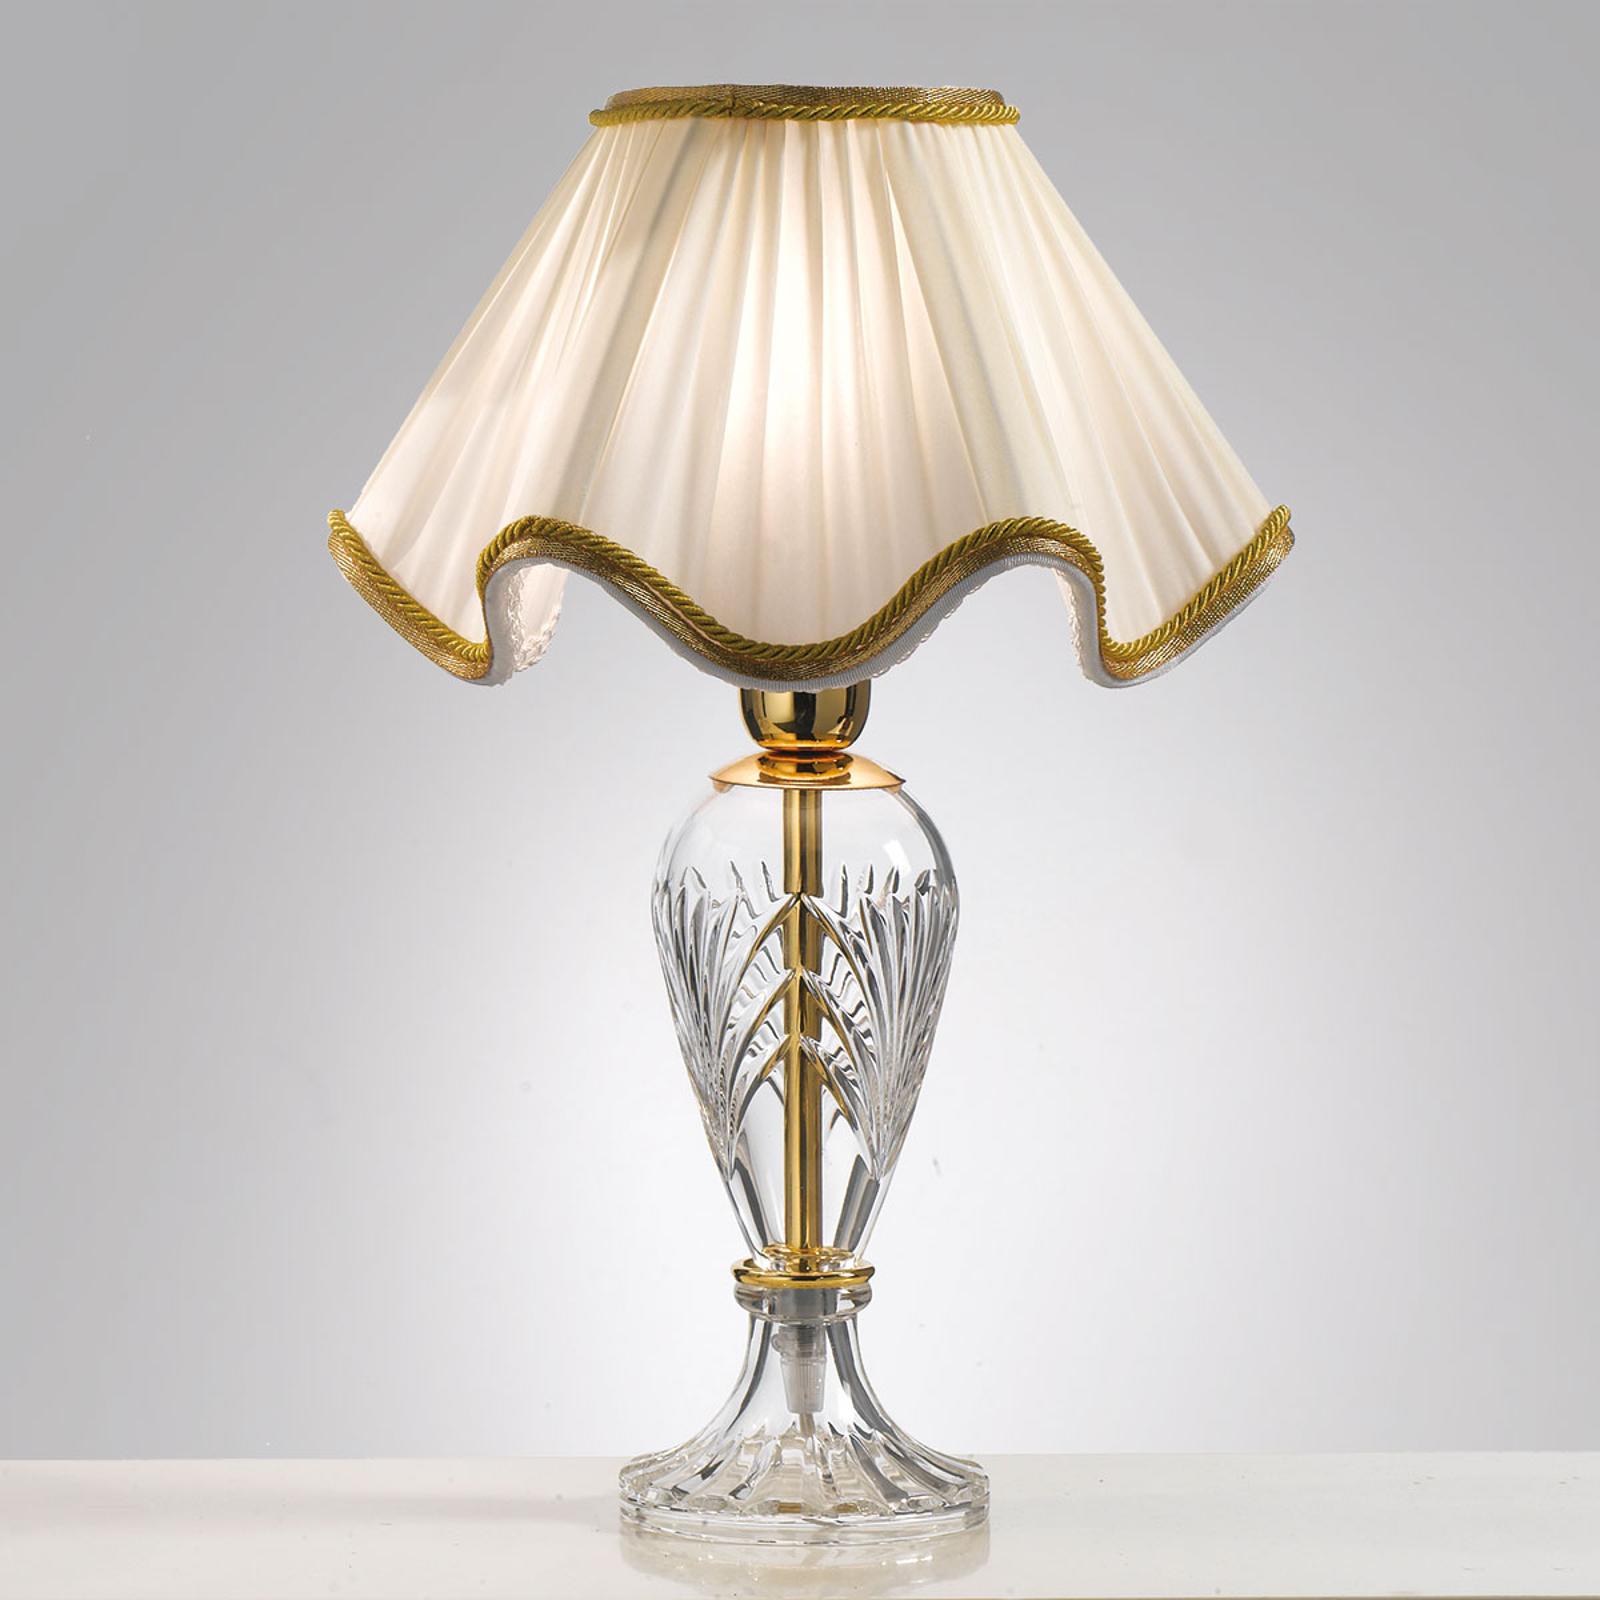 Beautiful Belle Epoque table lamp, 48cm_2008189_1